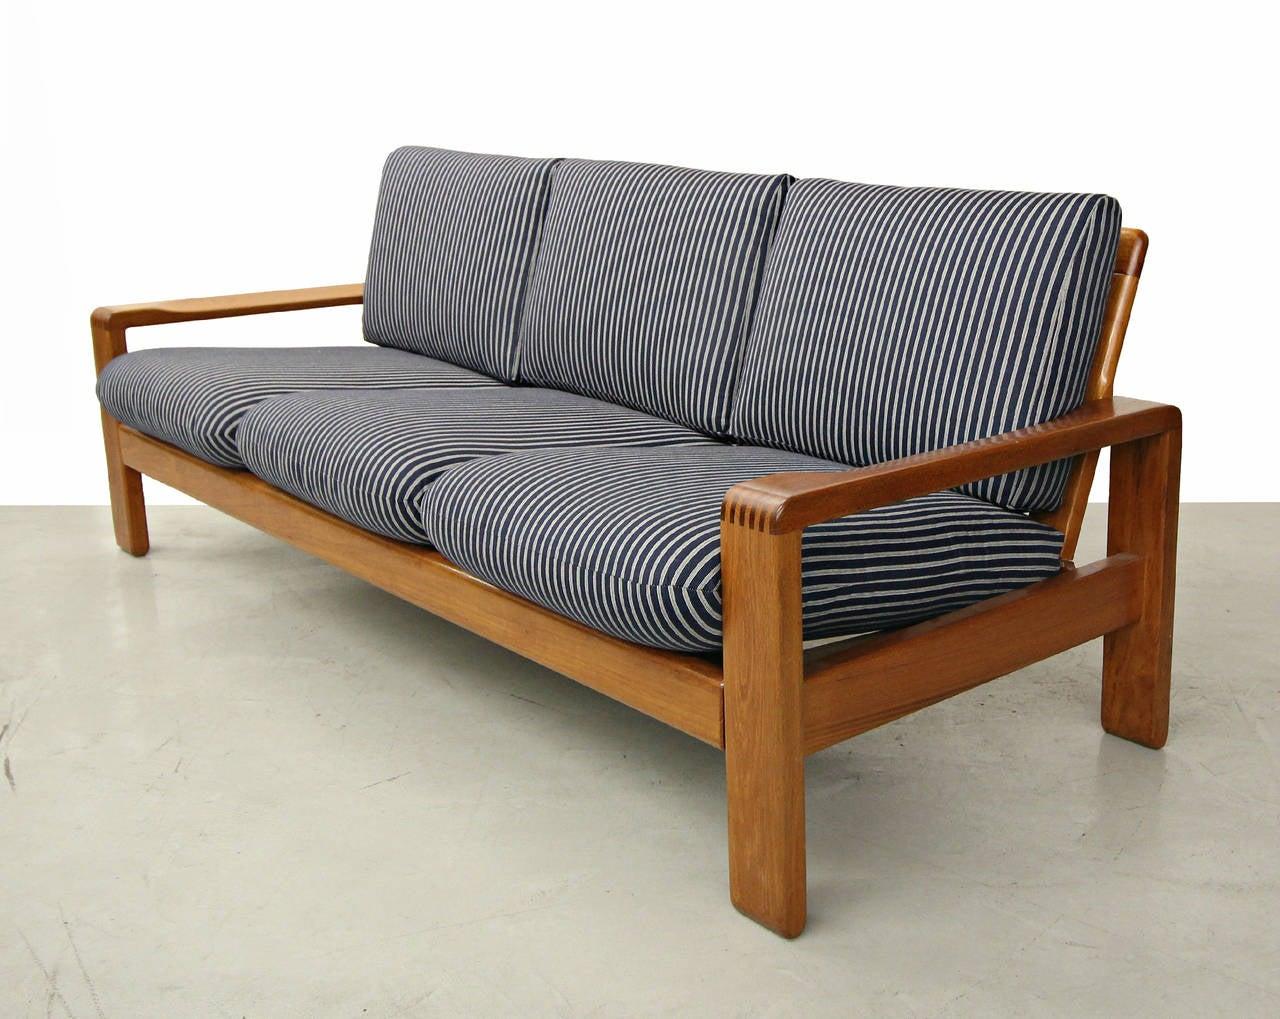 Solid danish teak slat back sofa by hw klein for bramin for Sofa u form klein